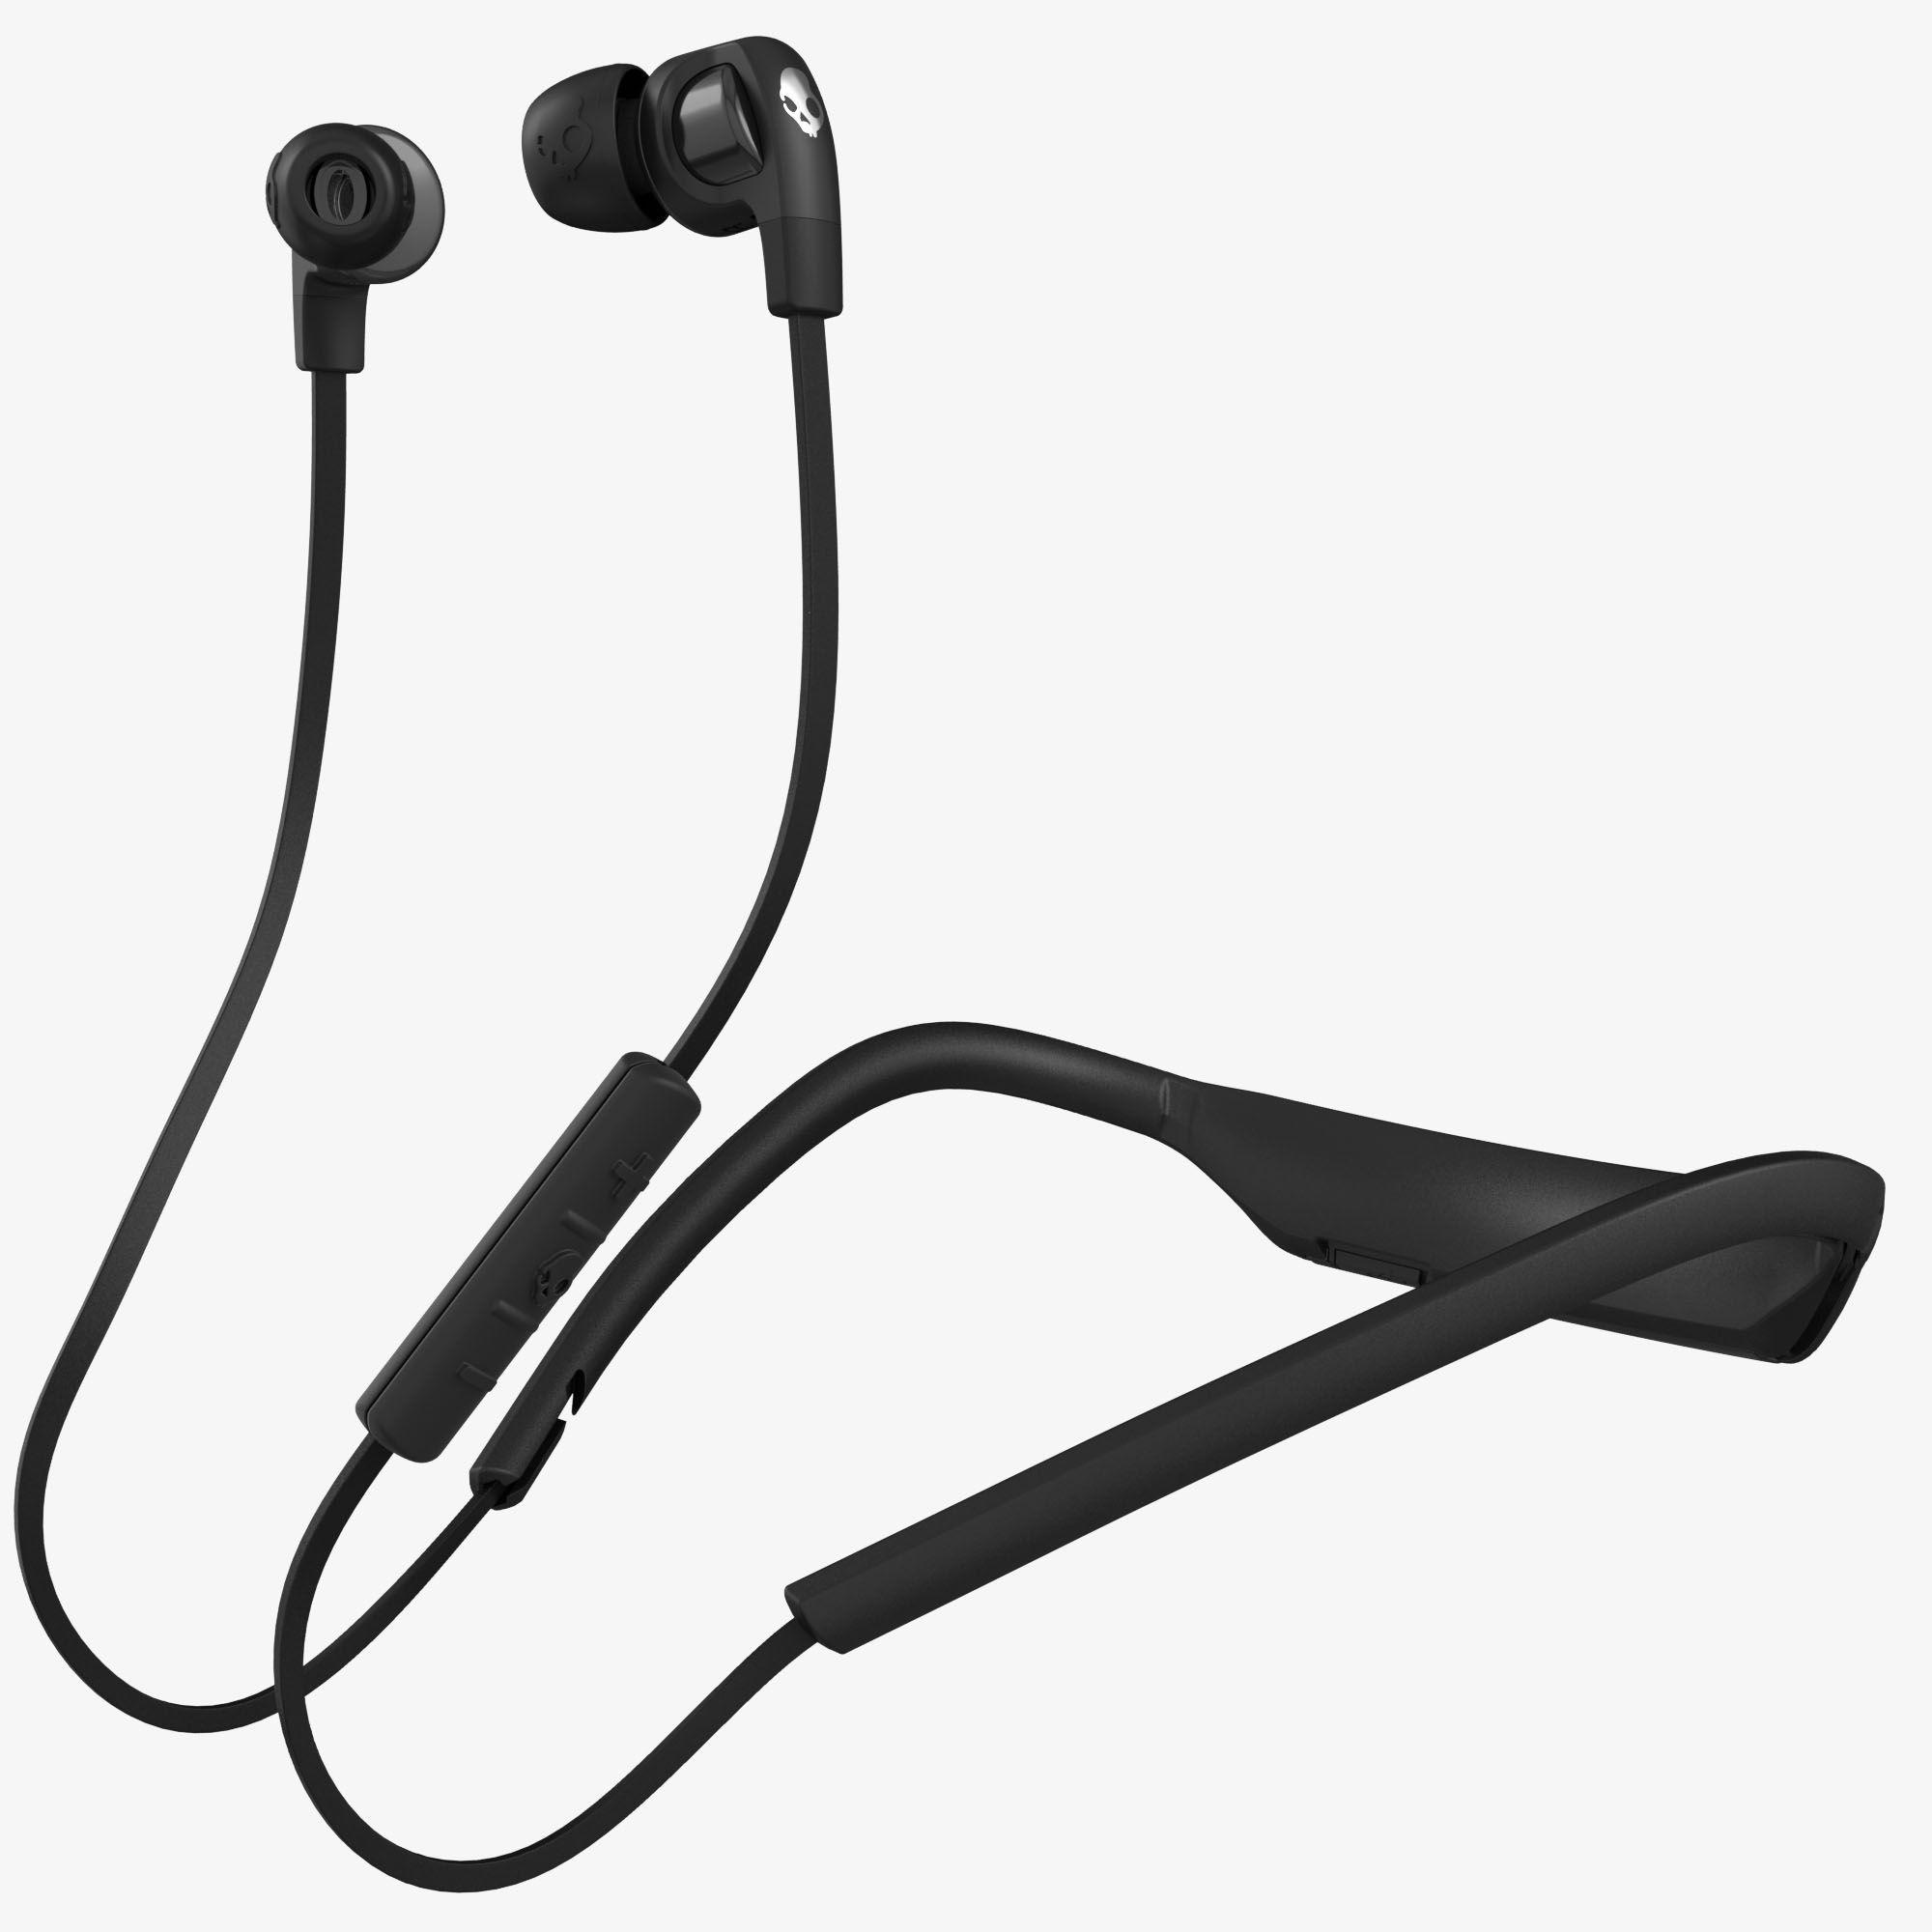 Earbuds sony black - wireless earbuds bluetooth black